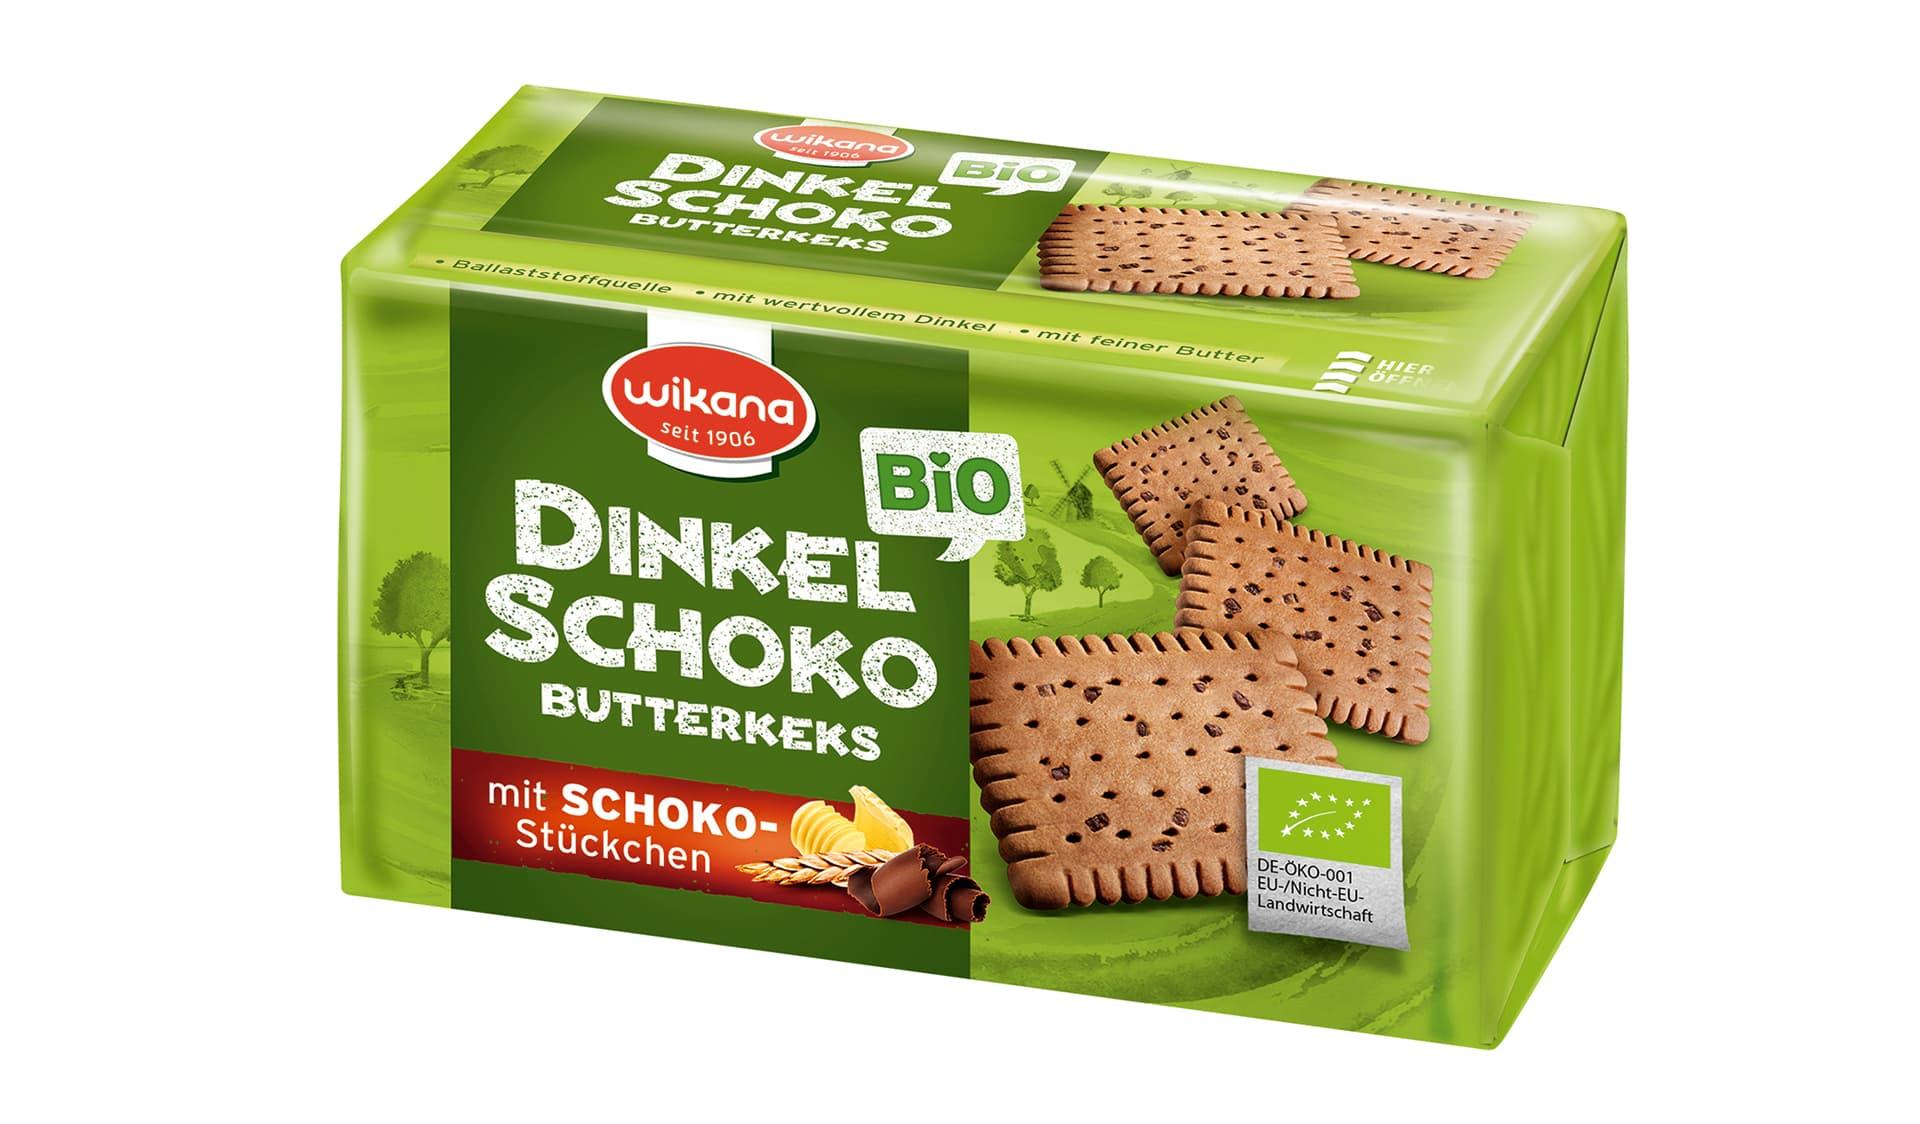 Wikana Dinkel Schoko Butterkeks (www.wikana.de)